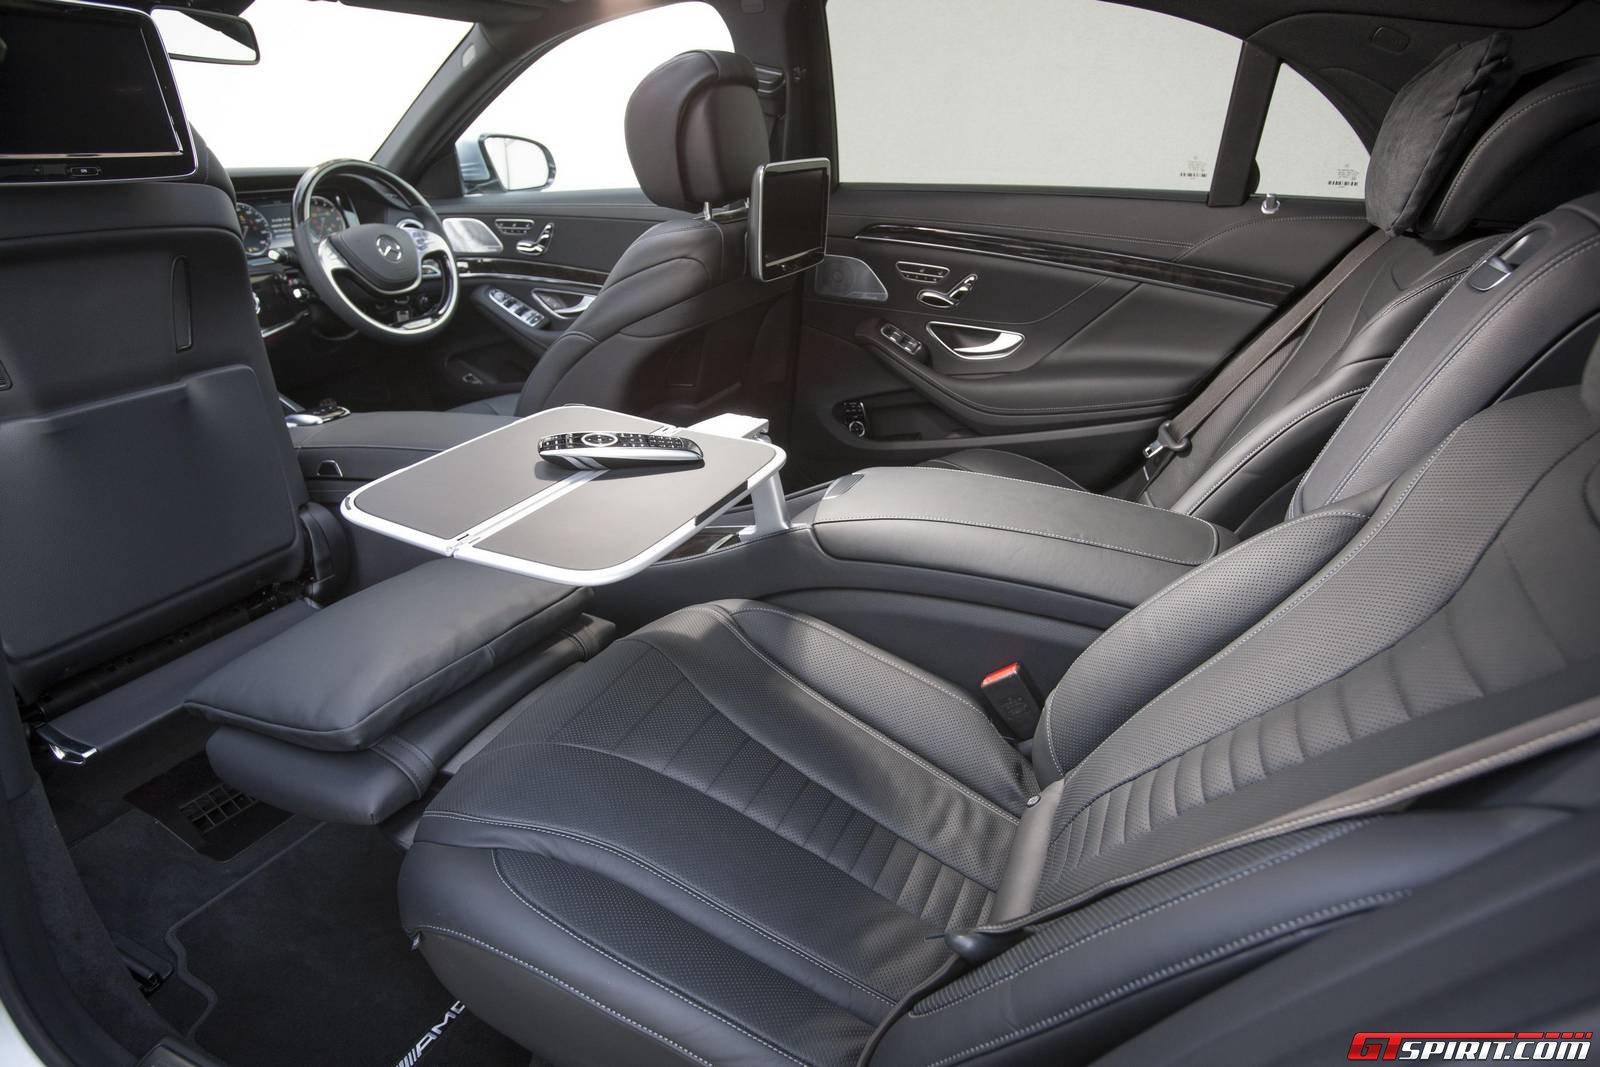 2015 Mercedes-Benz S500 Plug-in Hybrid Review - GTspirit